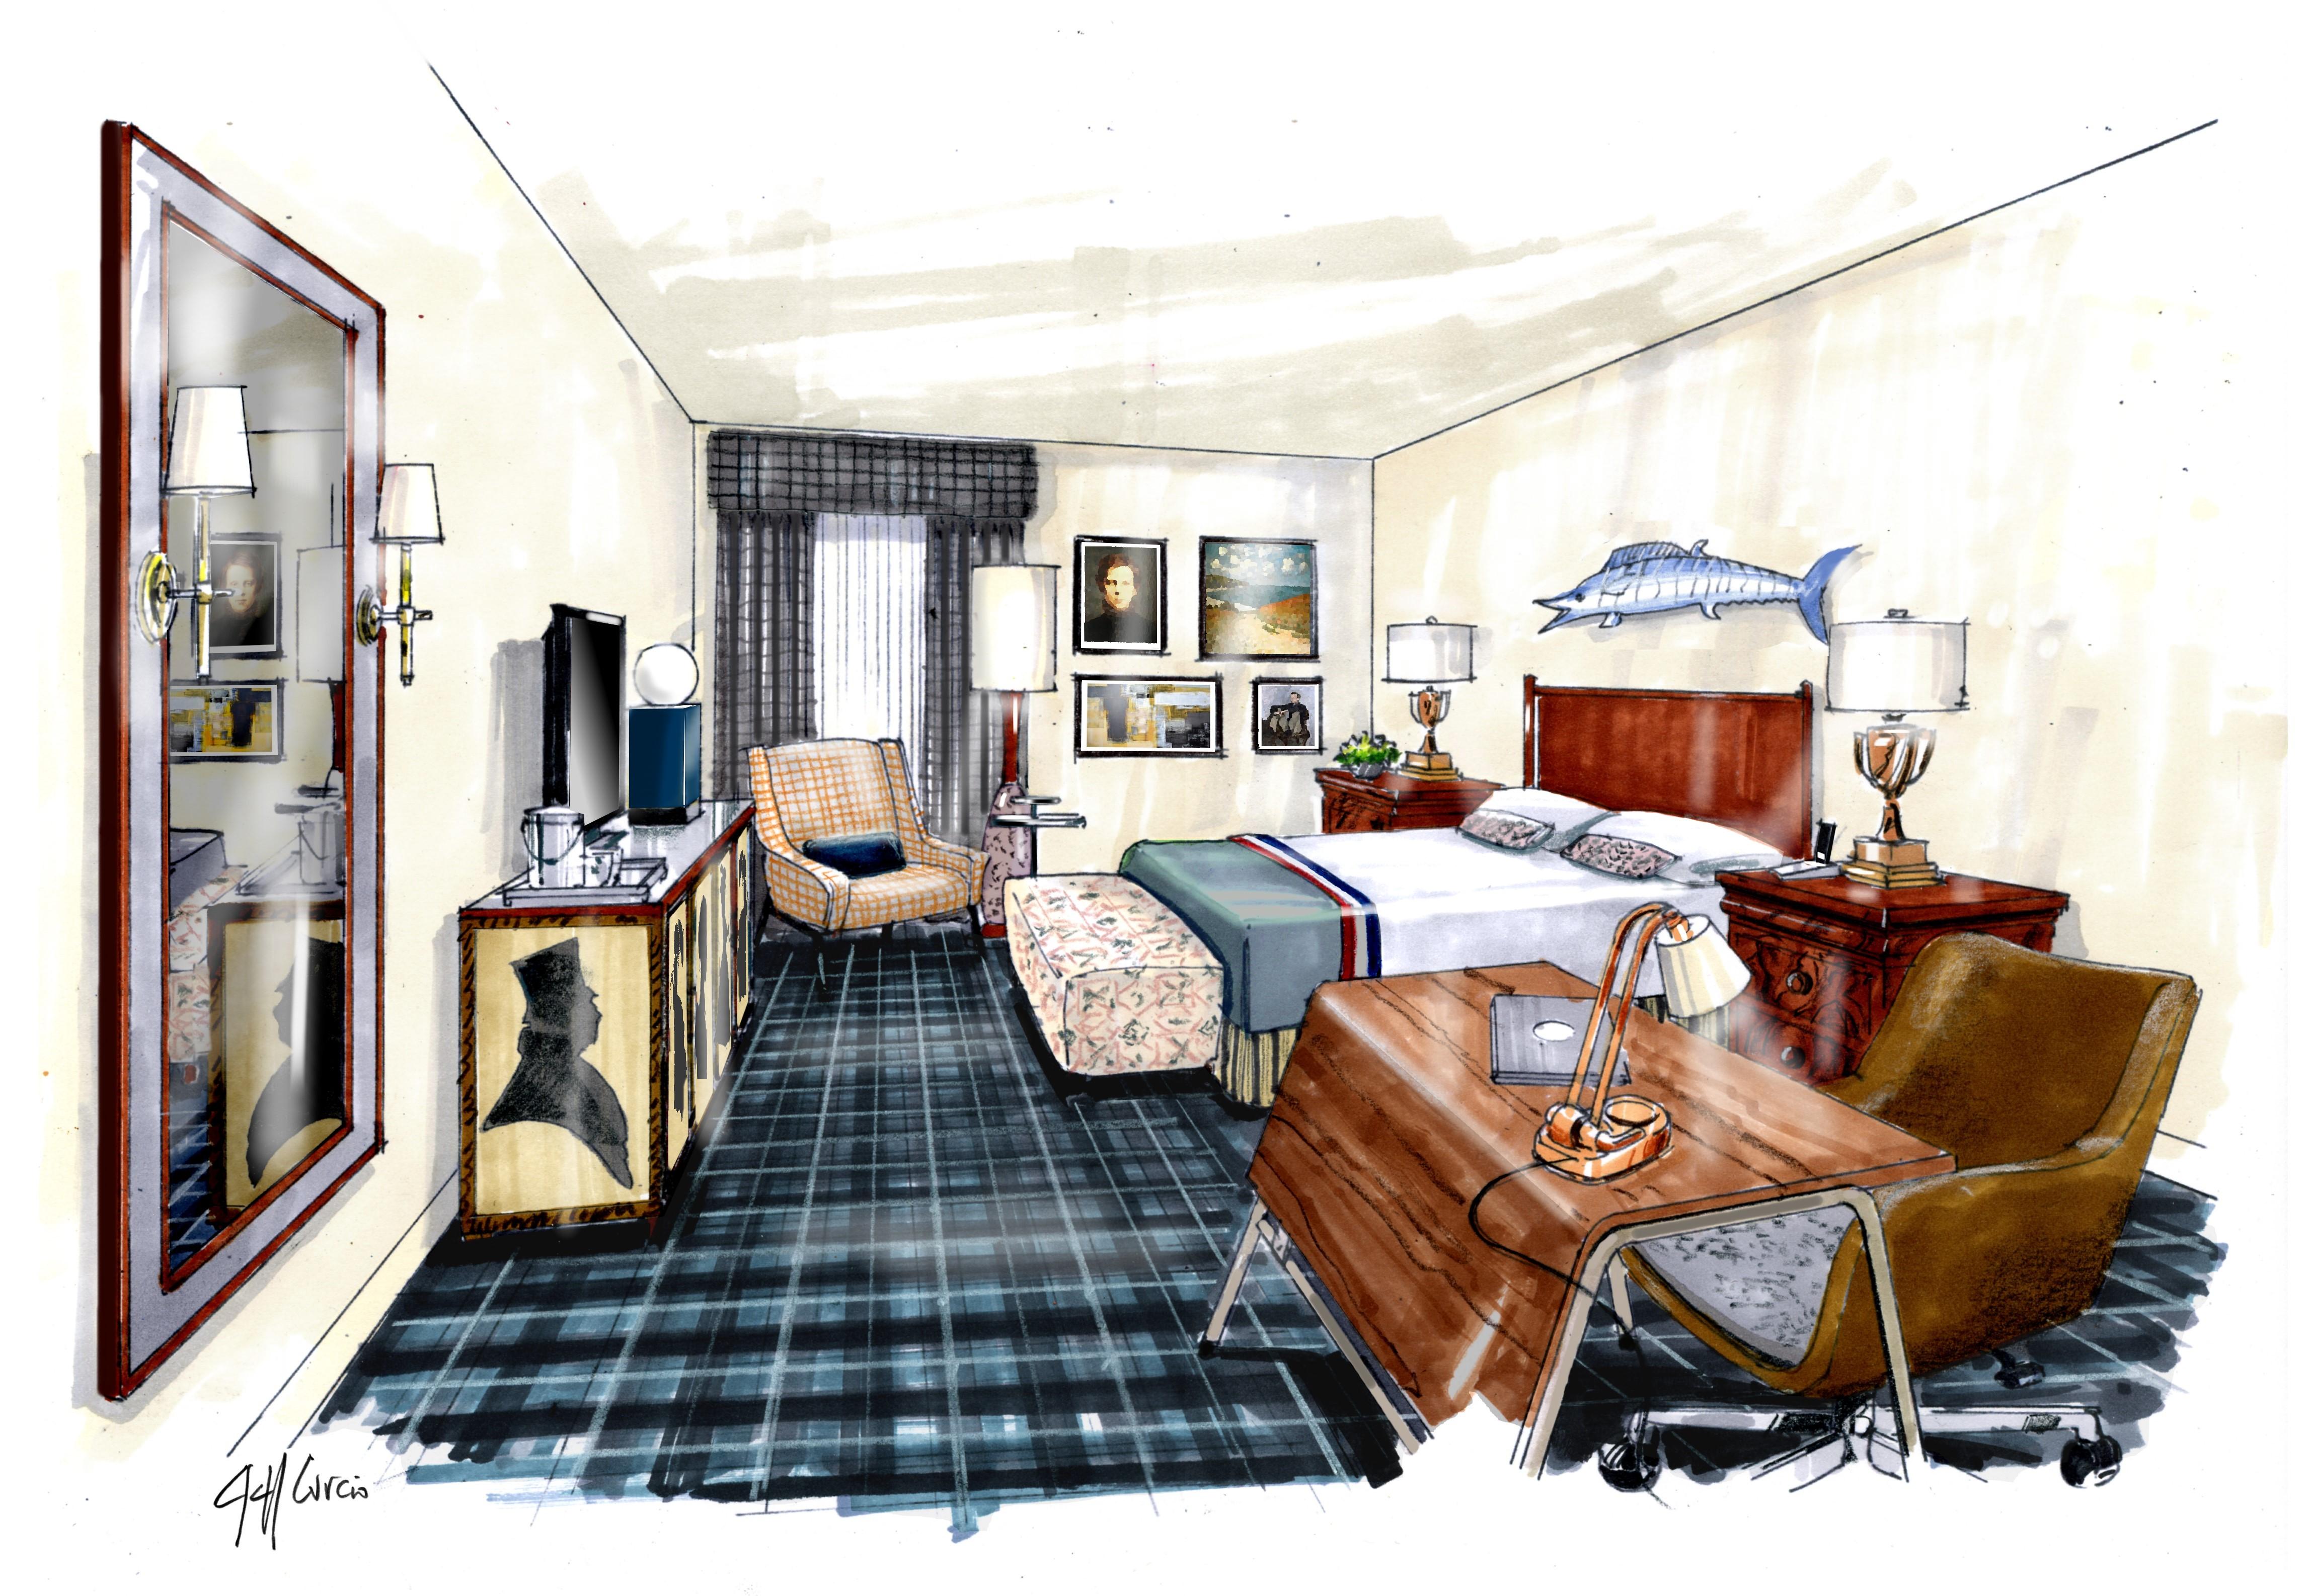 with 10m sale hotel begins brand switch richmond bizsense. Black Bedroom Furniture Sets. Home Design Ideas